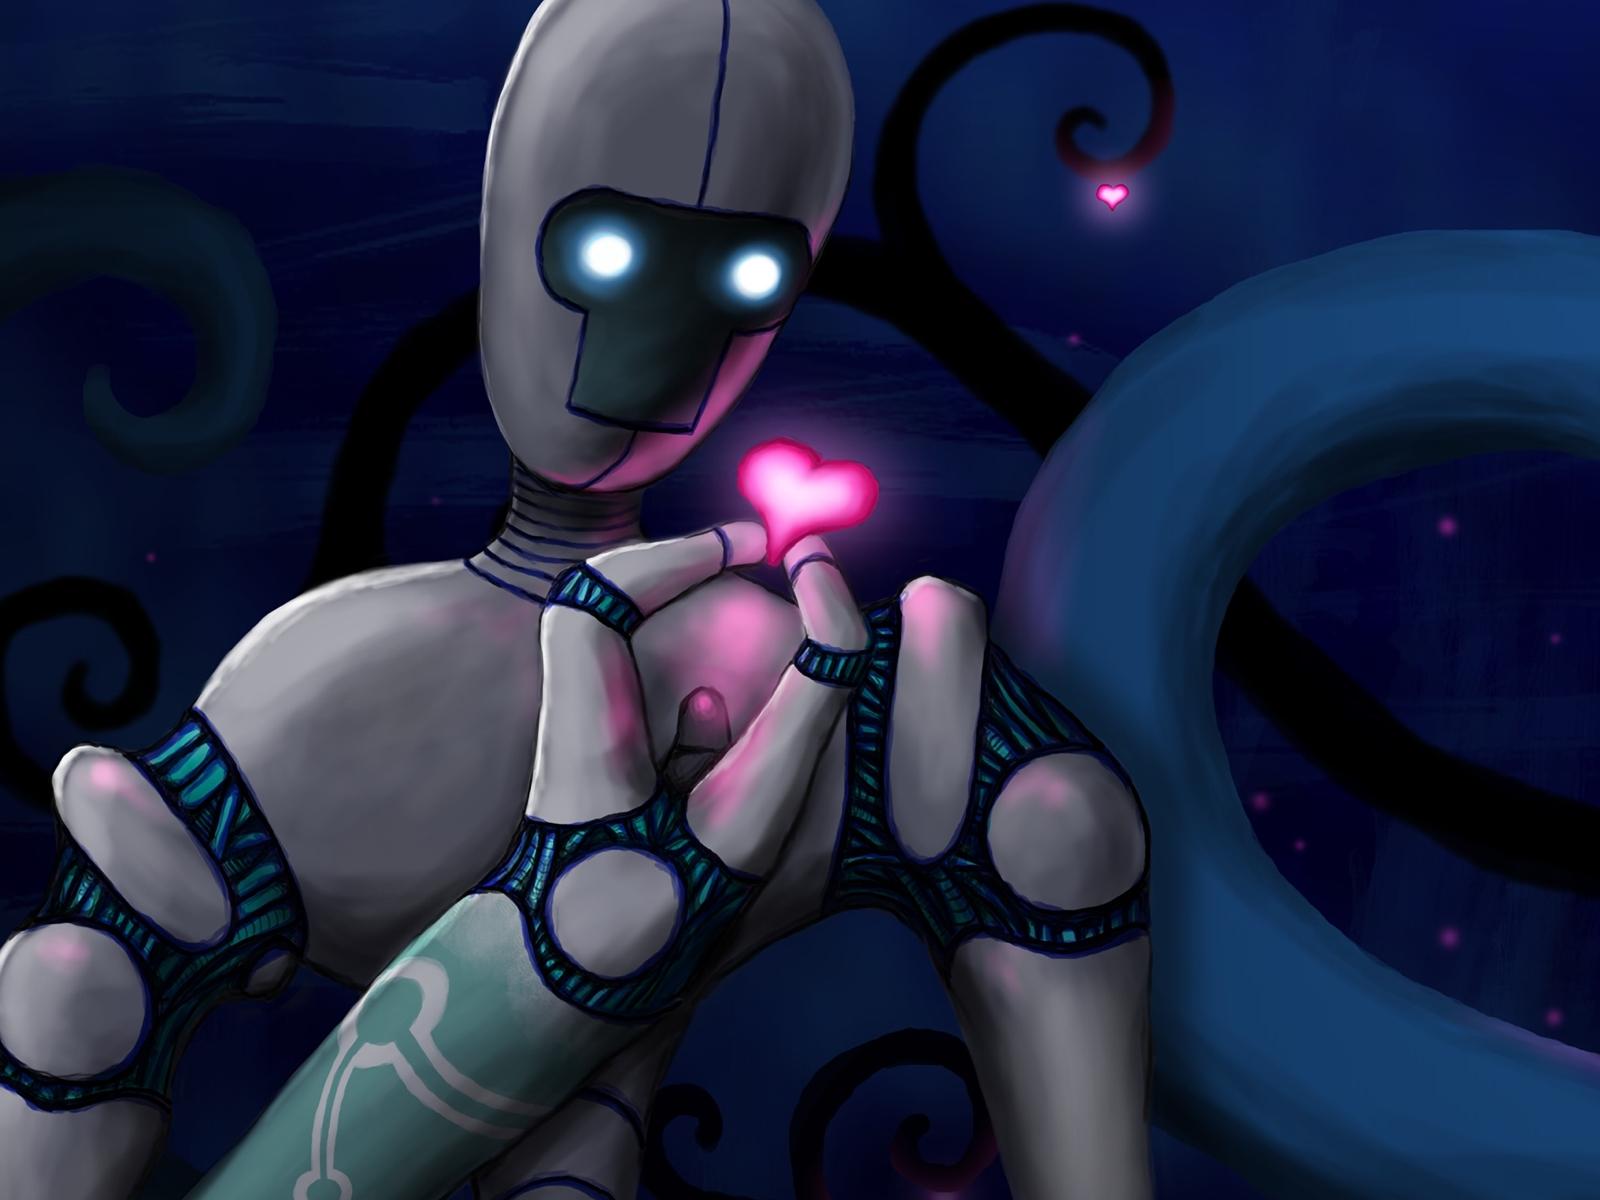 What All Robots Lack